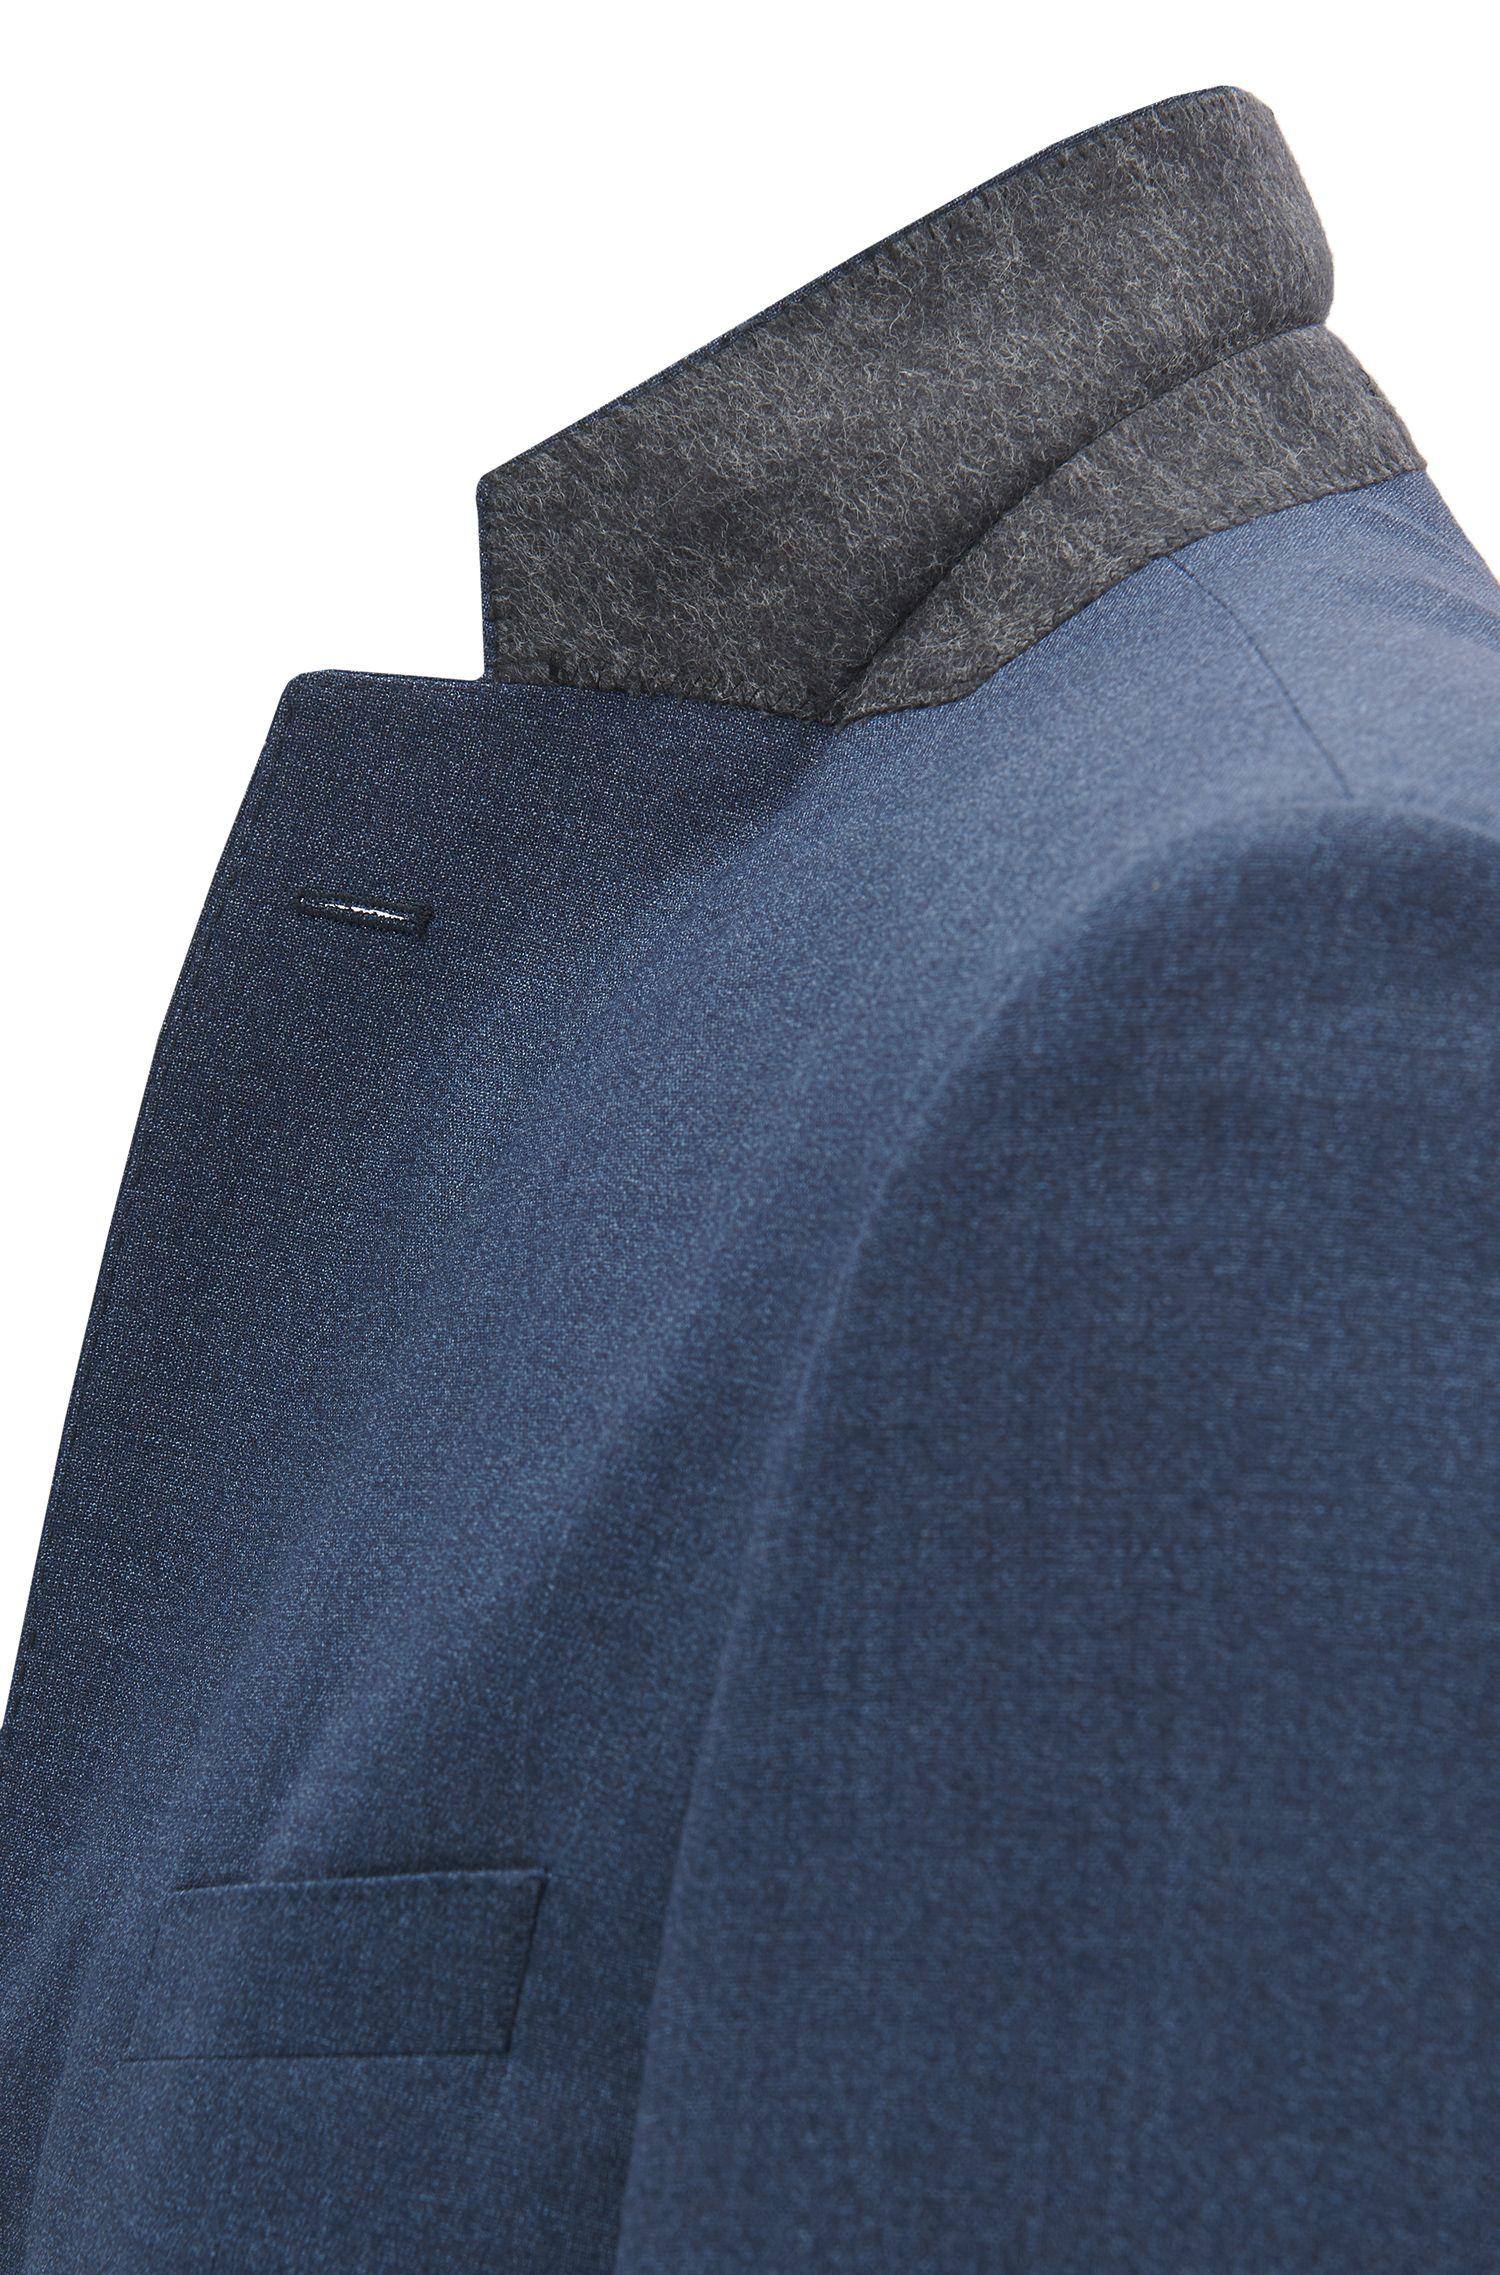 Regular-fit suit in mélange virgin wool